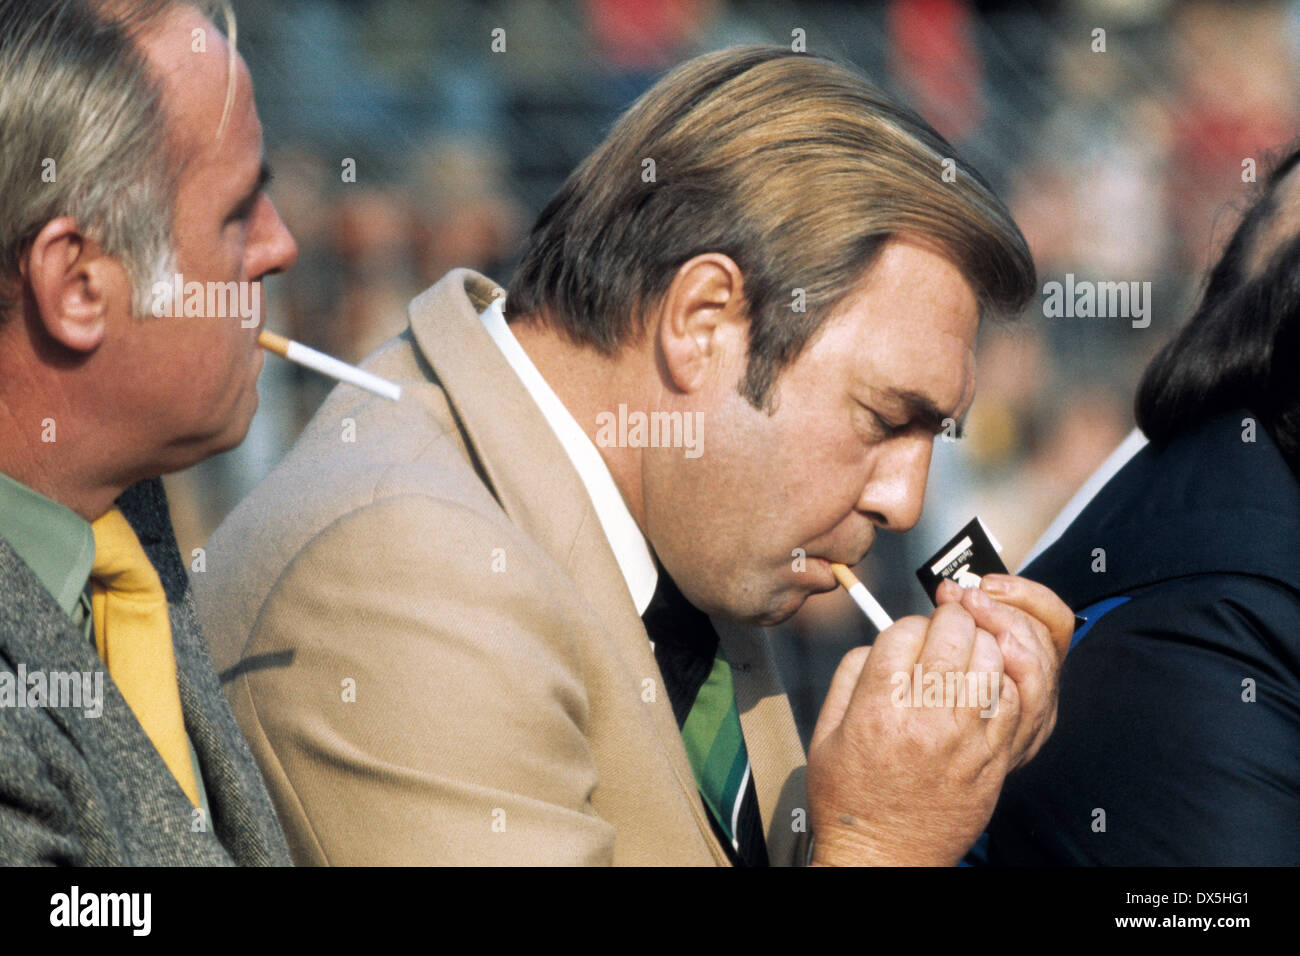 football, Bundesliga, 1975/1976, Grotenburg Stadium, FC Bayer 05 Uerdingen versus FC Schalke 04 3:2, president Guenther Siebert (S04) on the coaching bench, lighting a cigarette - Stock Image